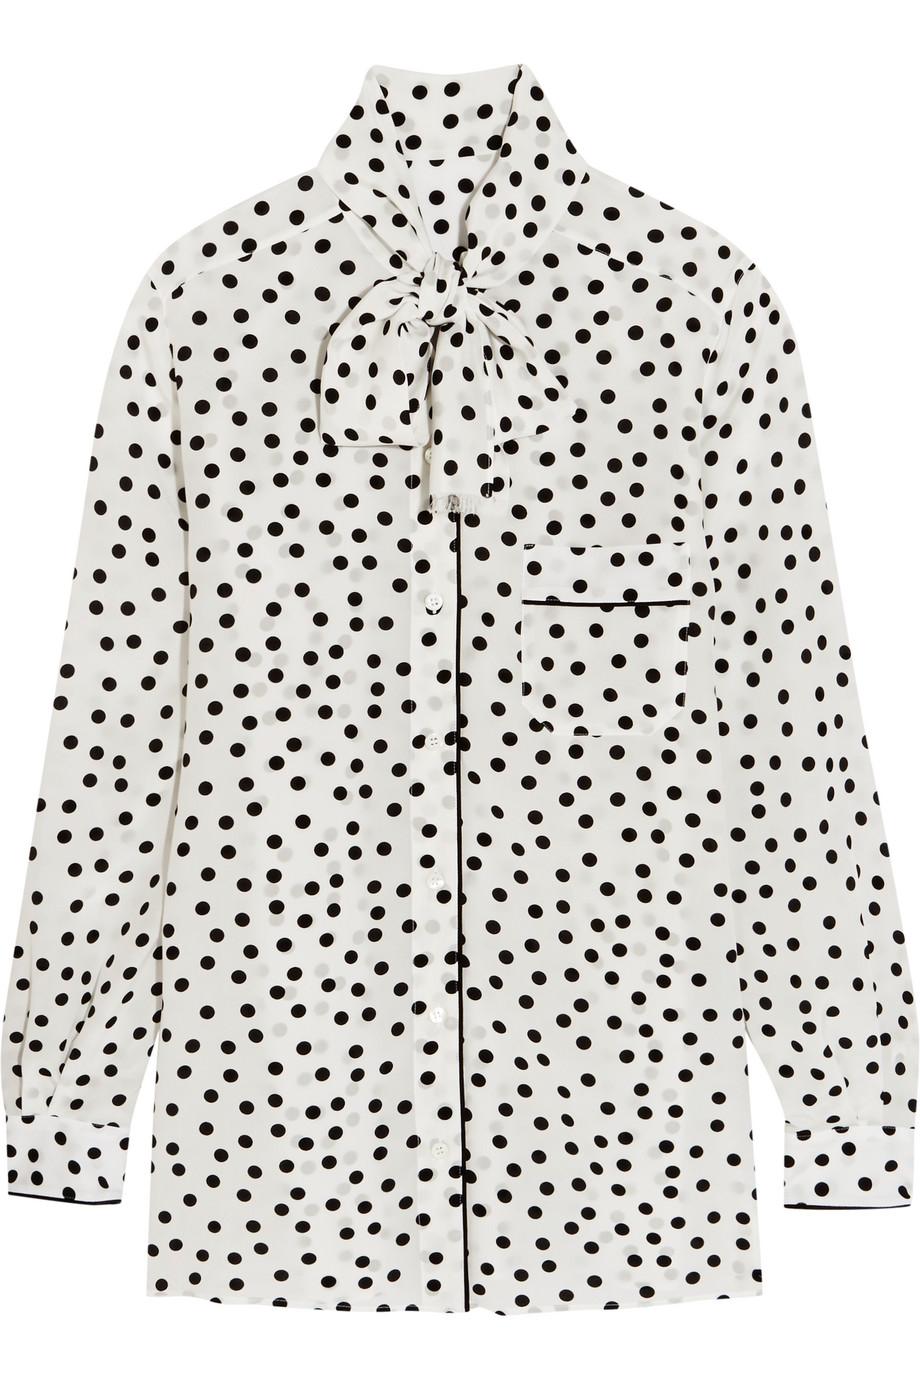 Dolce & Gabbana Pussy-Bow Polka-Dot Silk Crepe De Chine Blouse, White, Women's, Size: 48